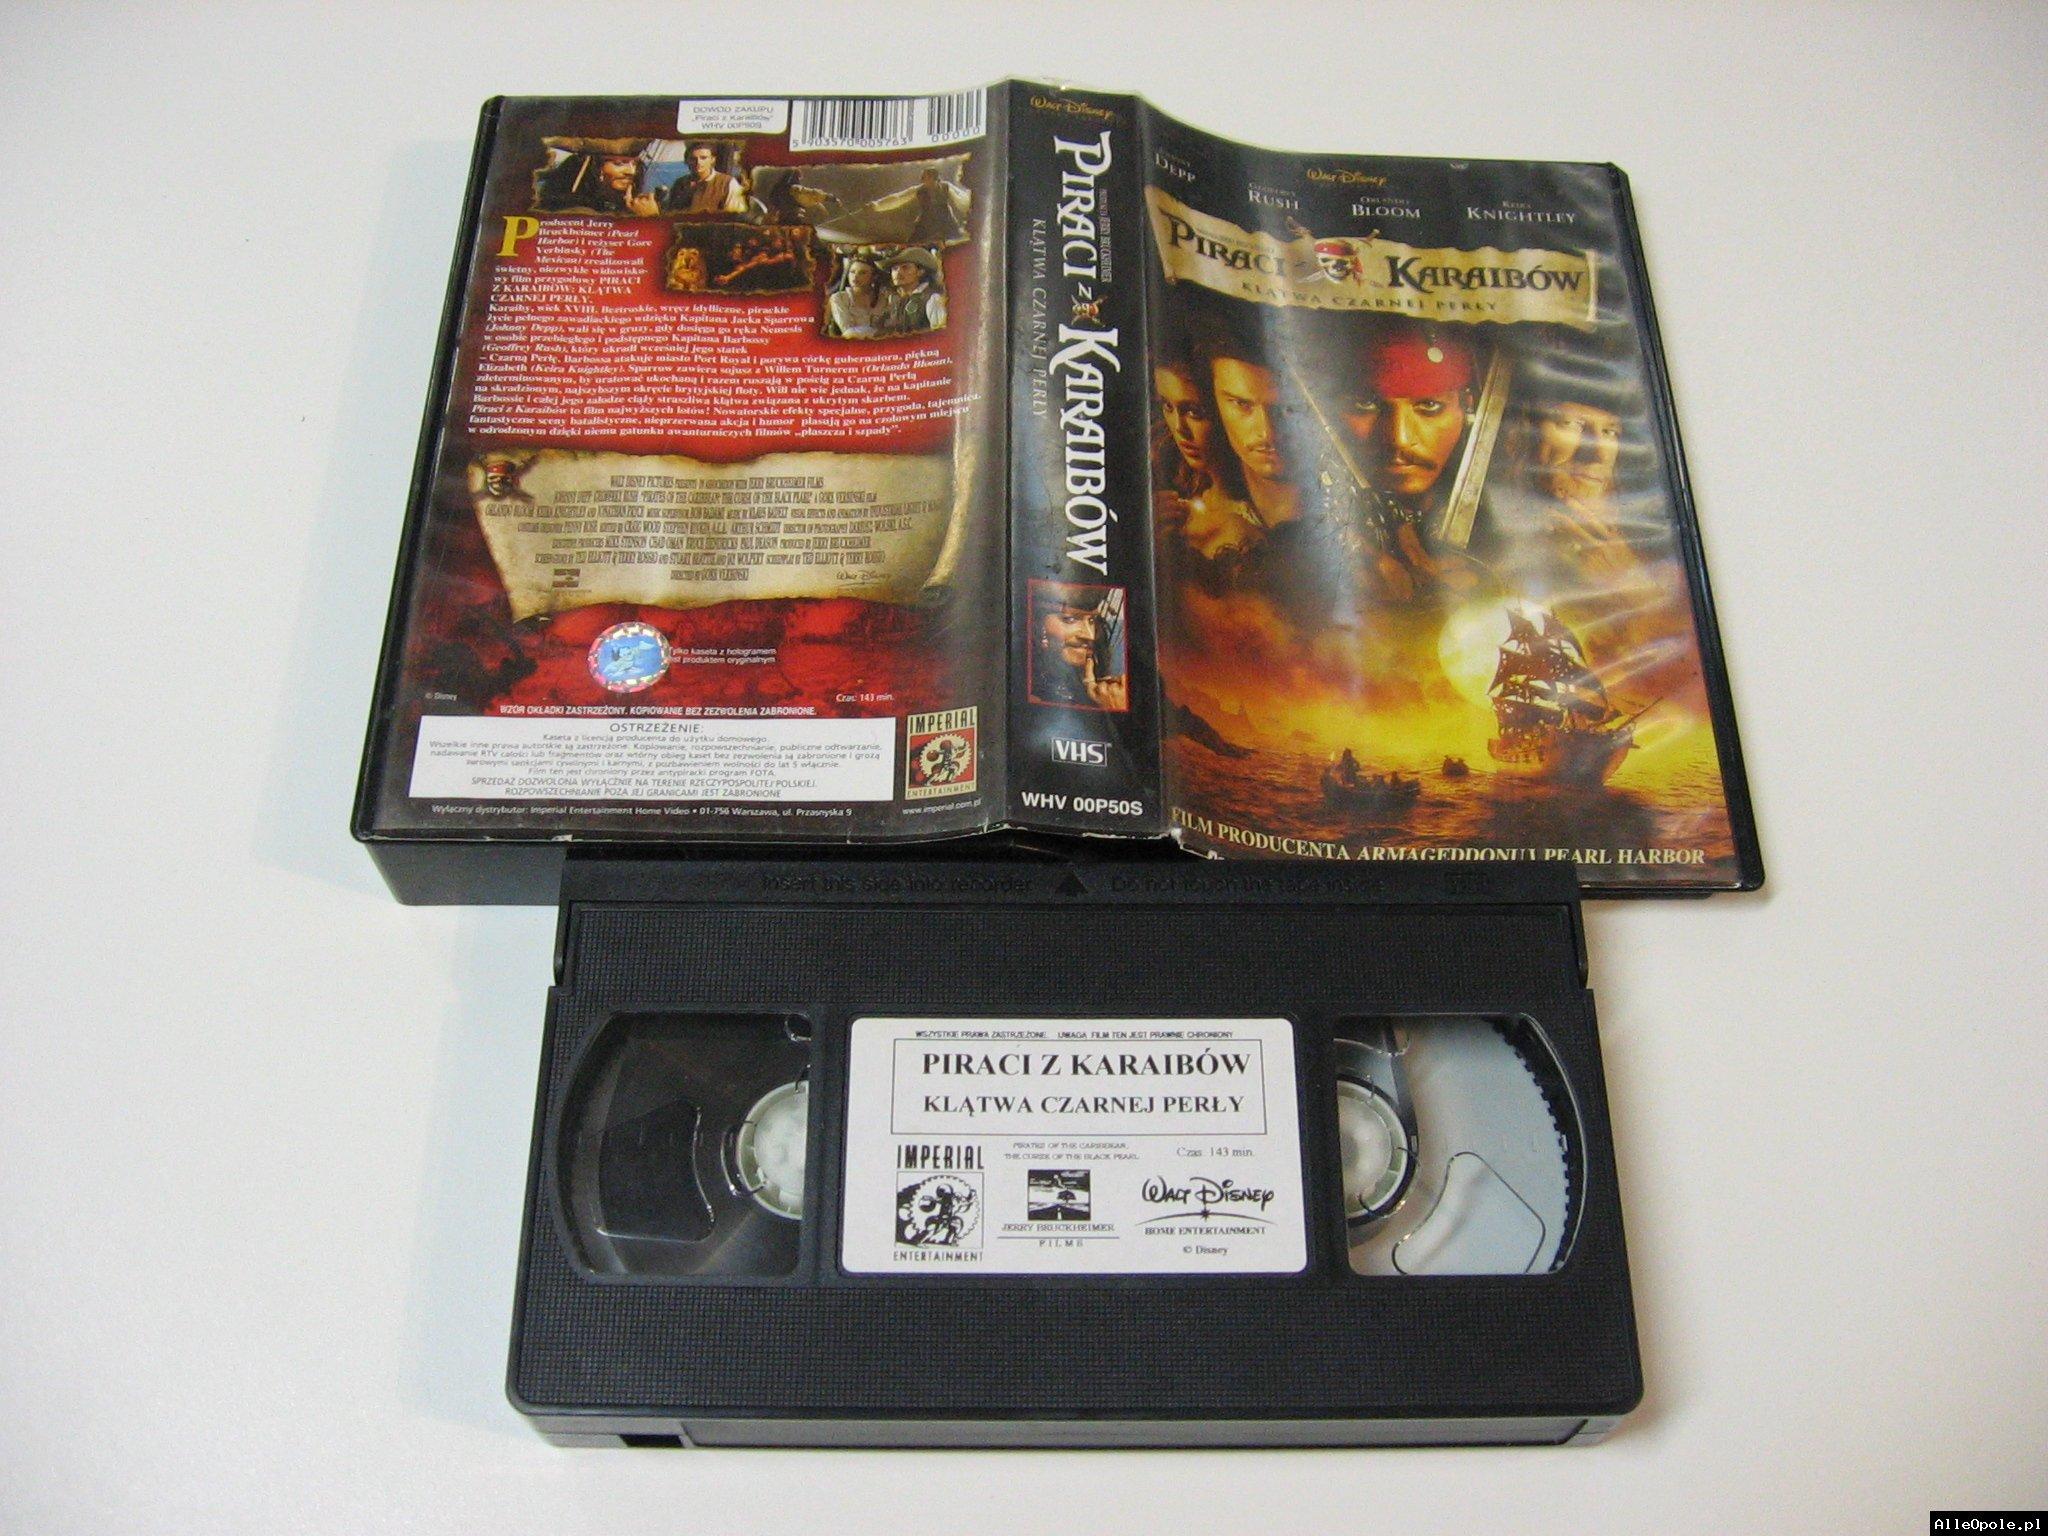 PIRACI Z KARAIBÓW KLONTWA CZARNEJ PERŁY - VHS Kaseta Video - Opole 1742